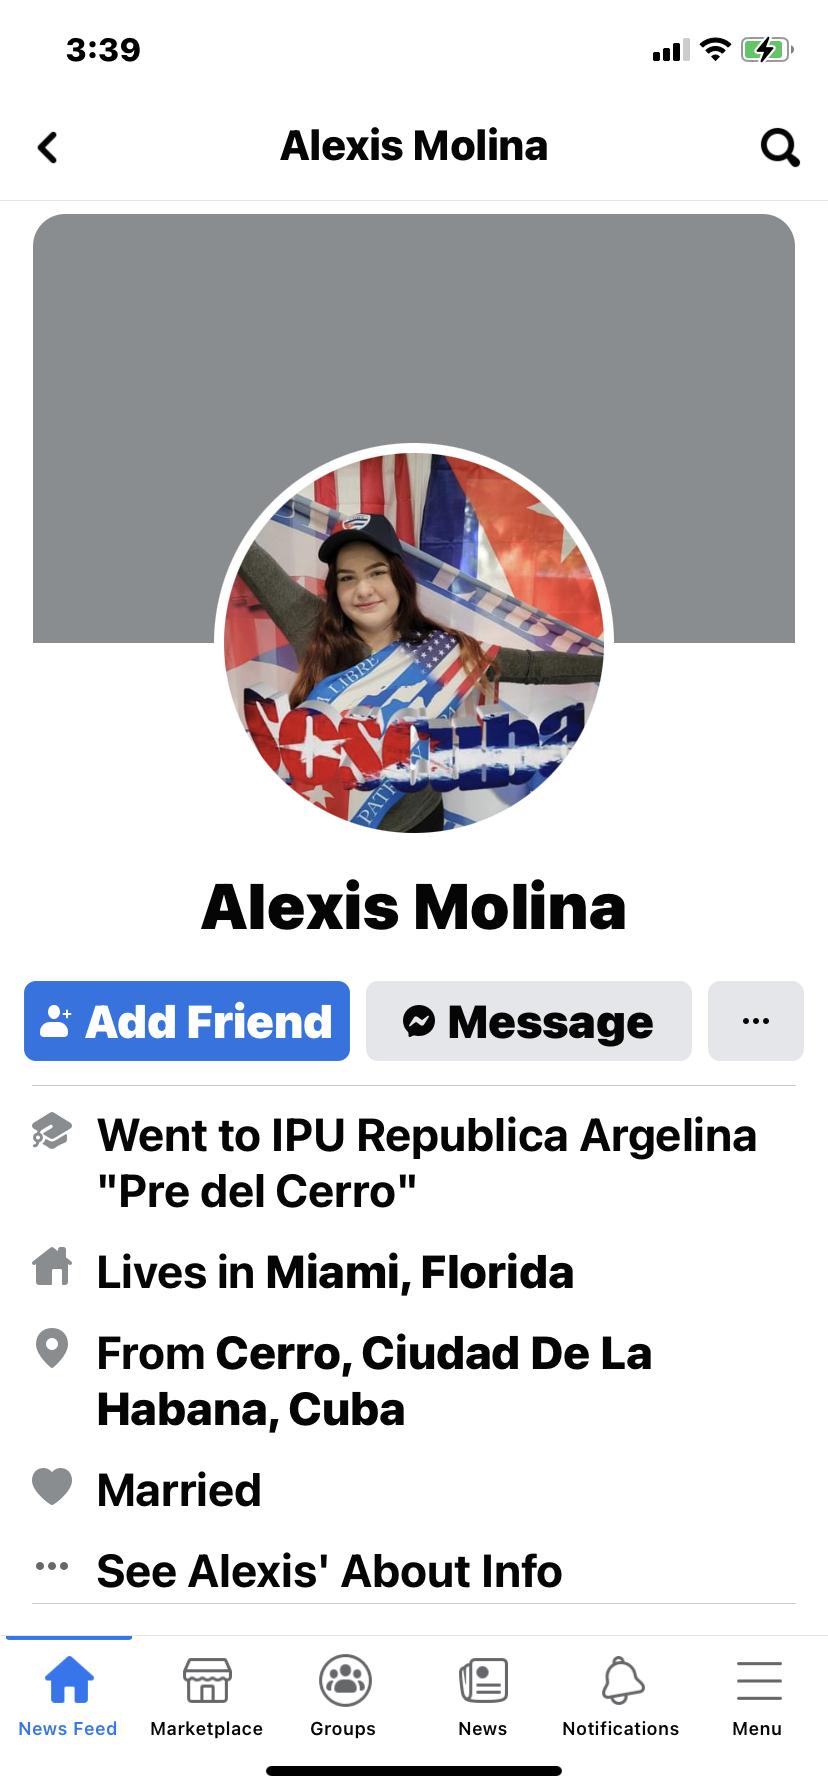 Alexis Molina